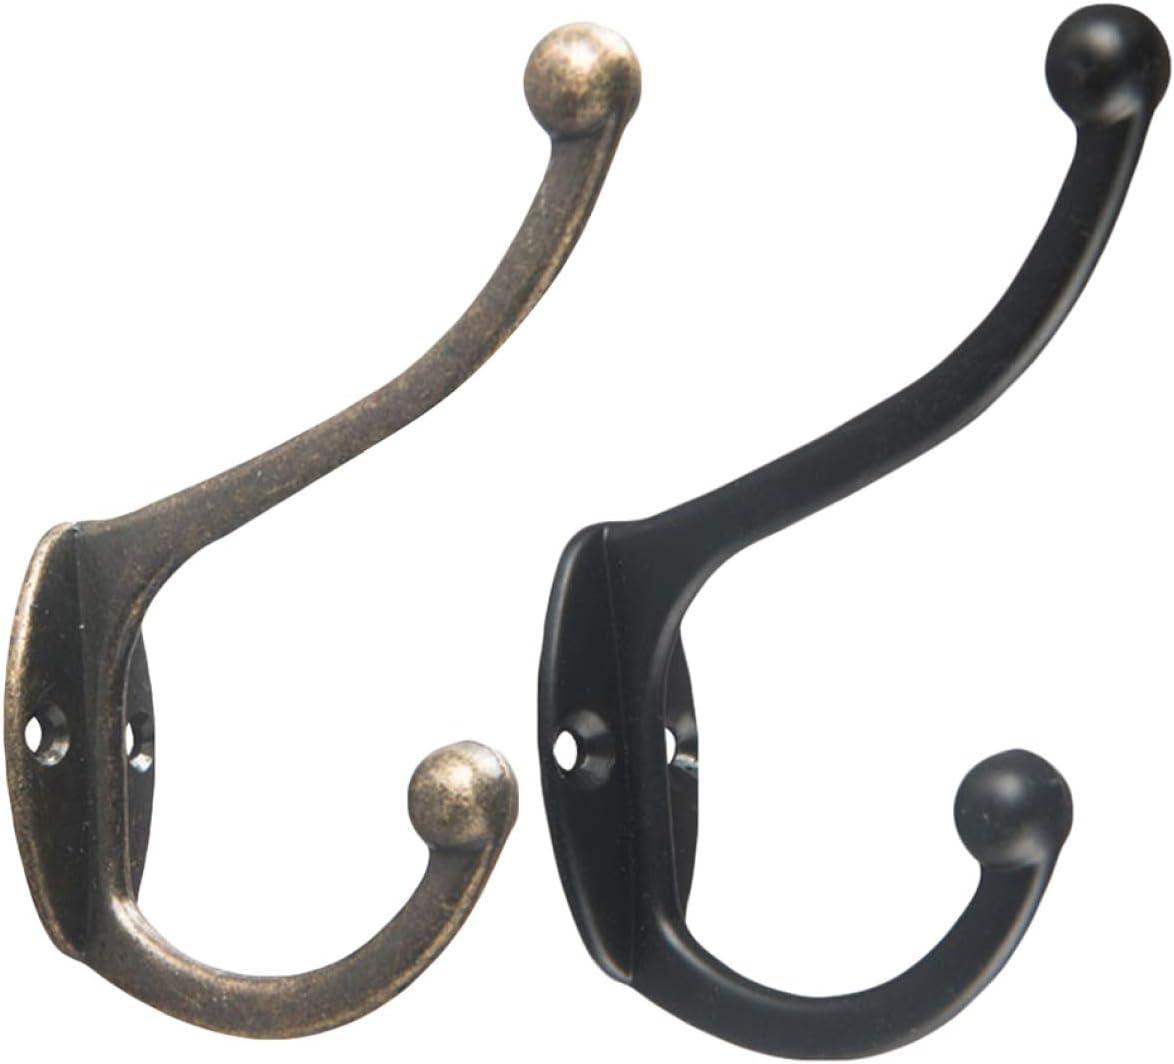 Classic Antique Vintage Hooks Cast Iron Double Coat Hook Home Key Hanger Holder